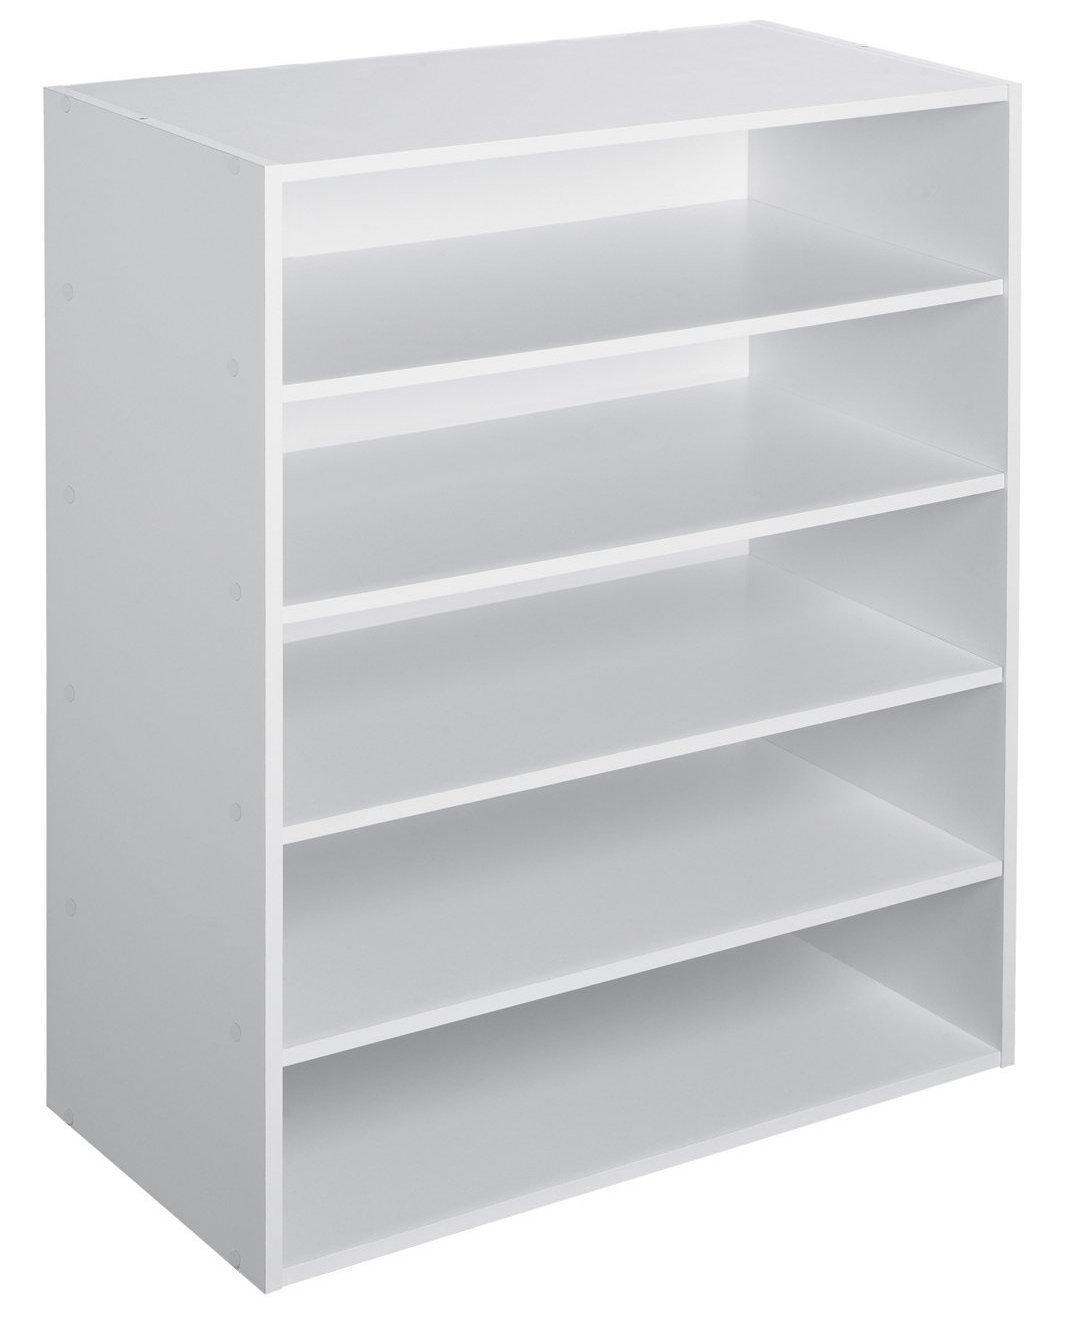 Attrayant Amazon.com: ClosetMaid 1565 Stackable 5 Shelf Organizer, White: Home U0026  Kitchen